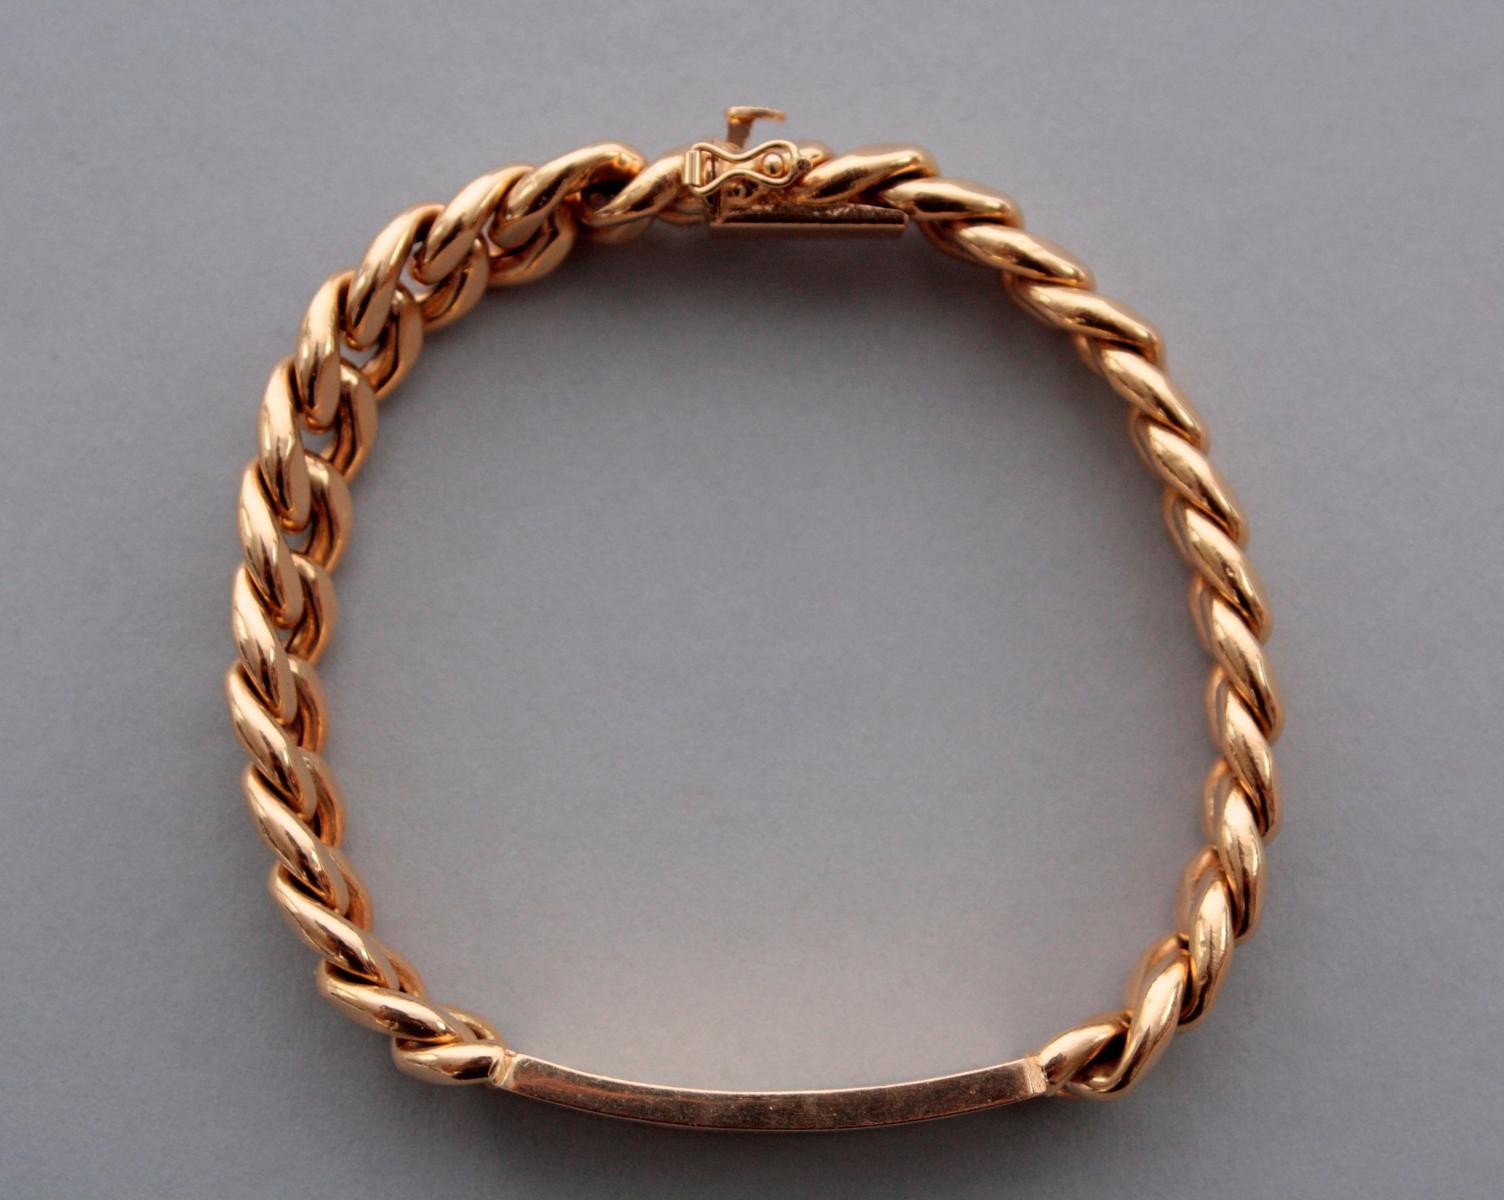 Armband mit Gravur, 18 Karat Gelbgold-4